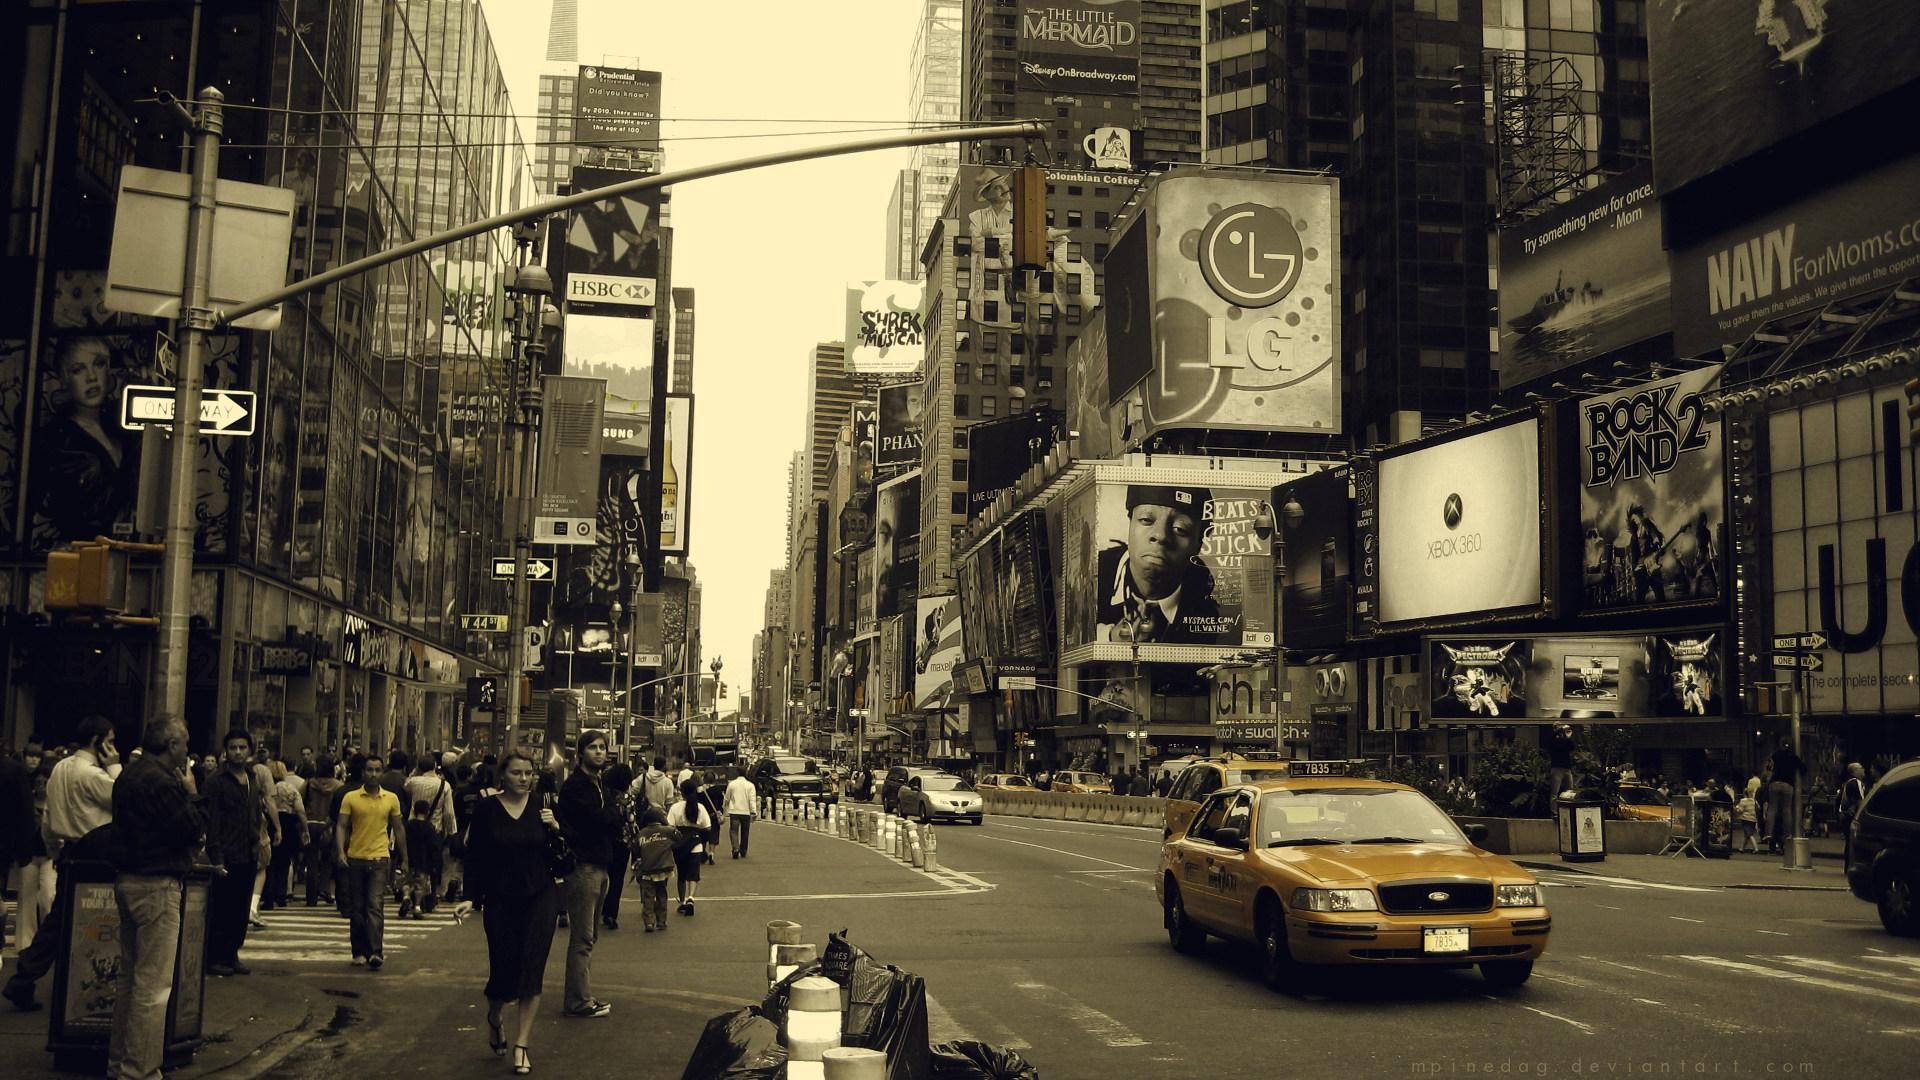 Image hd wallpaper new york 53 album new york wallpaper image hd wallpaper new york 53 album new york wallpaper wallpapers fond ecran fond ecrans desktop hd grand format images voltagebd Images